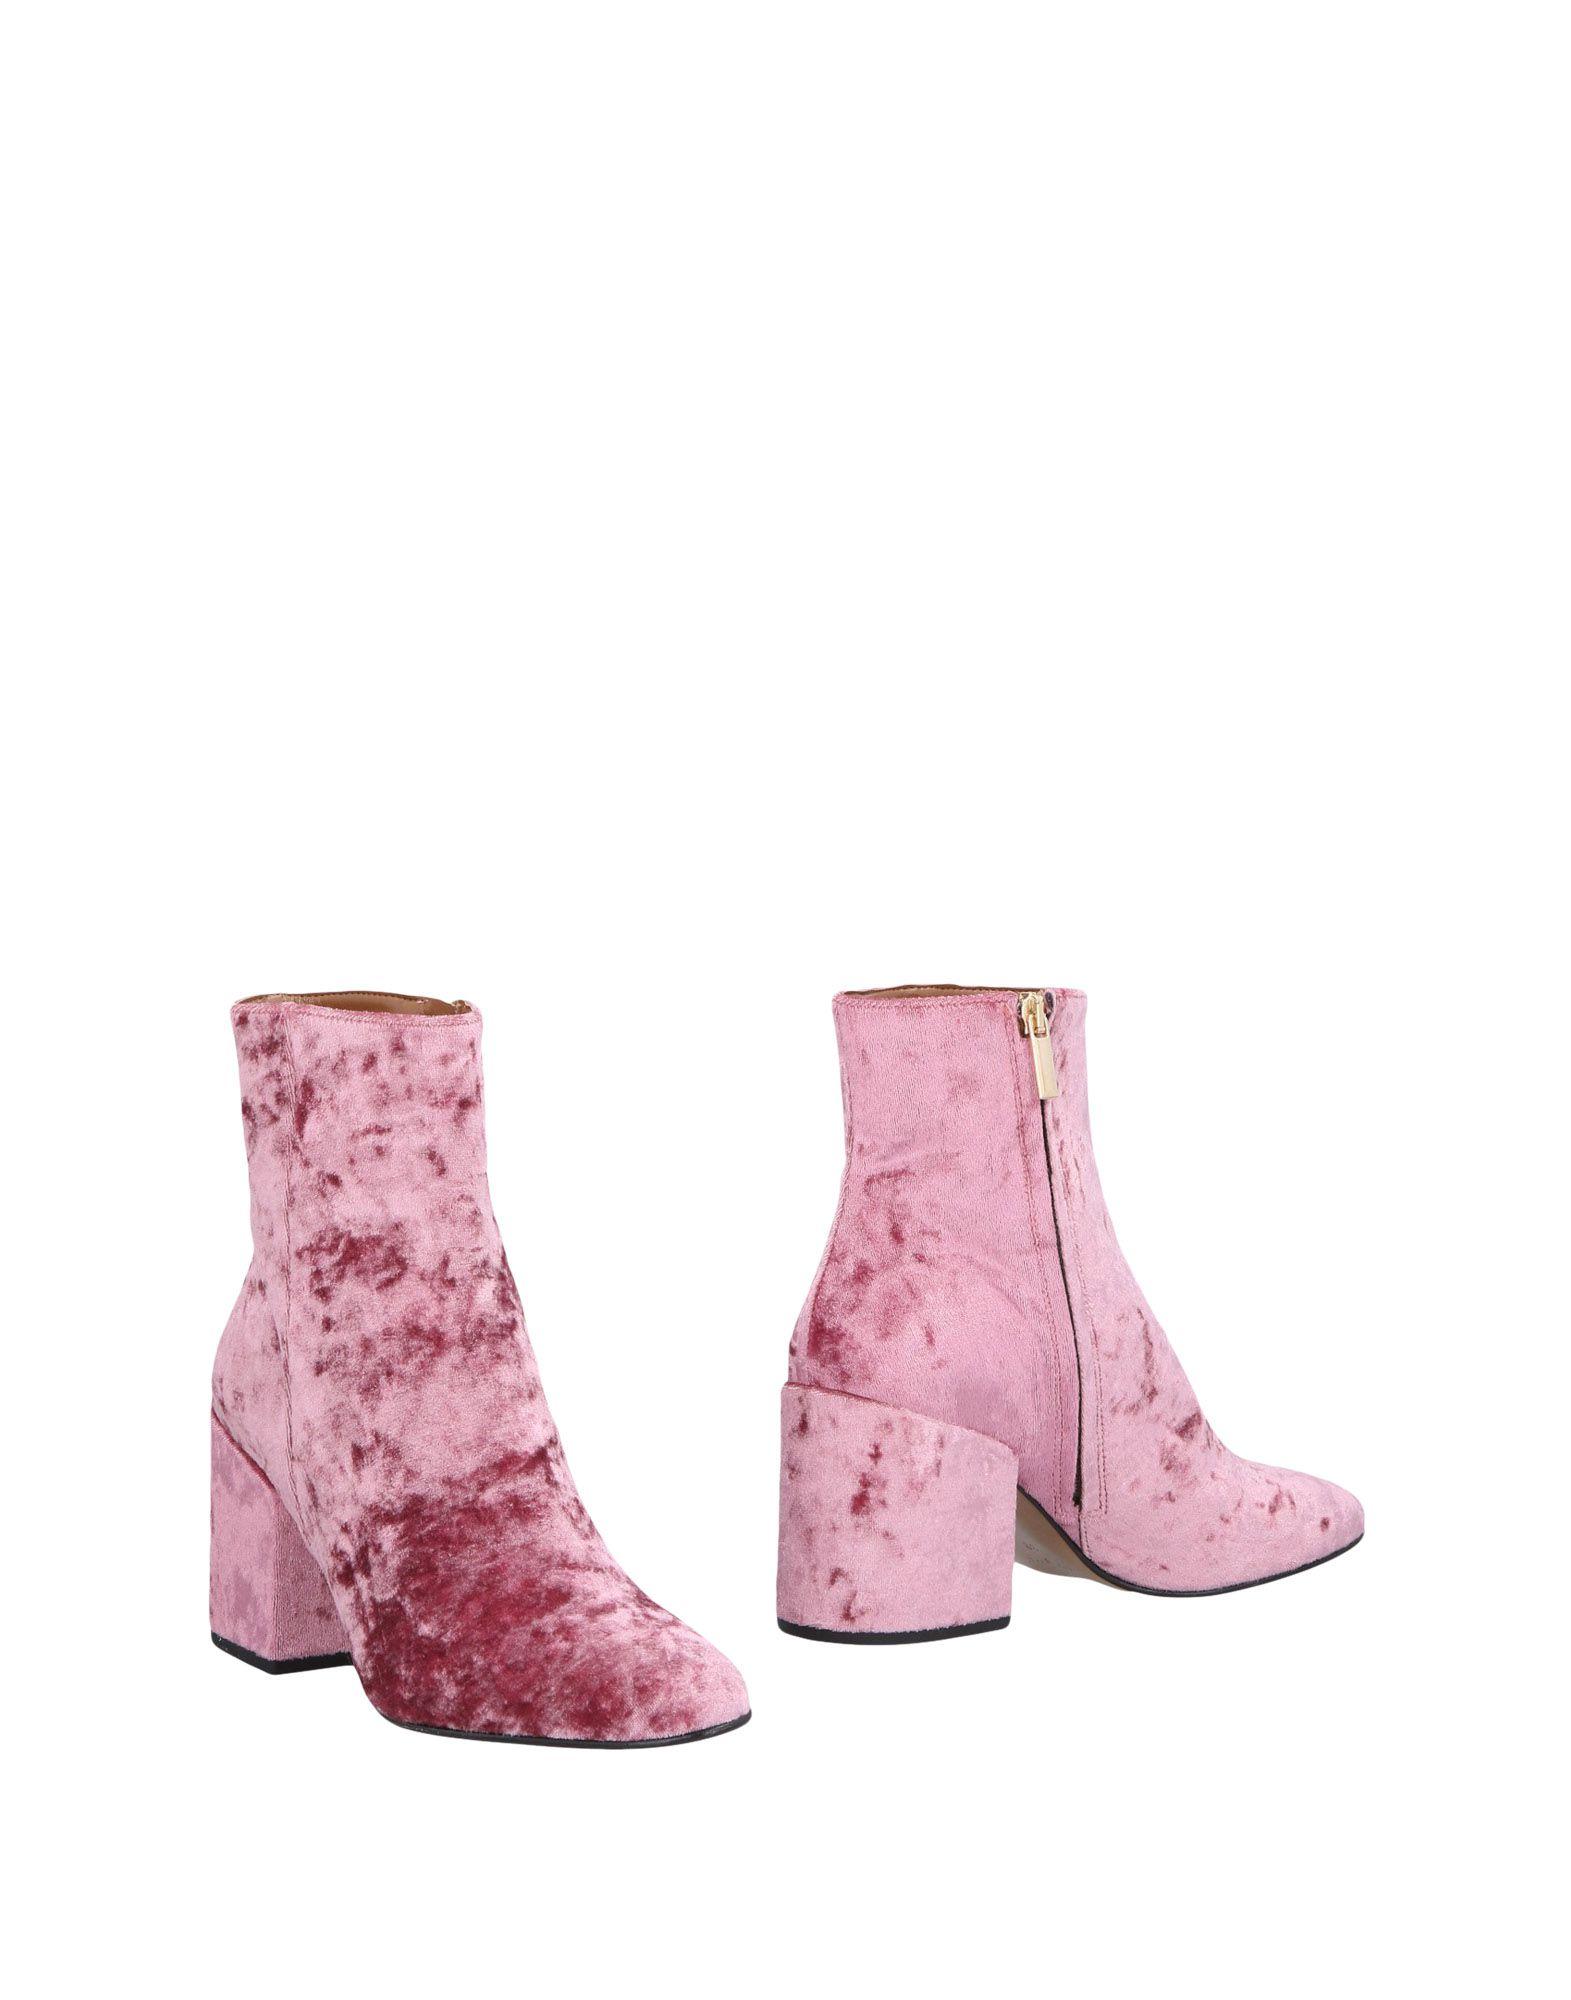 Bianca Di Stiefelette Damen  11471127IL Gute Qualität beliebte Schuhe